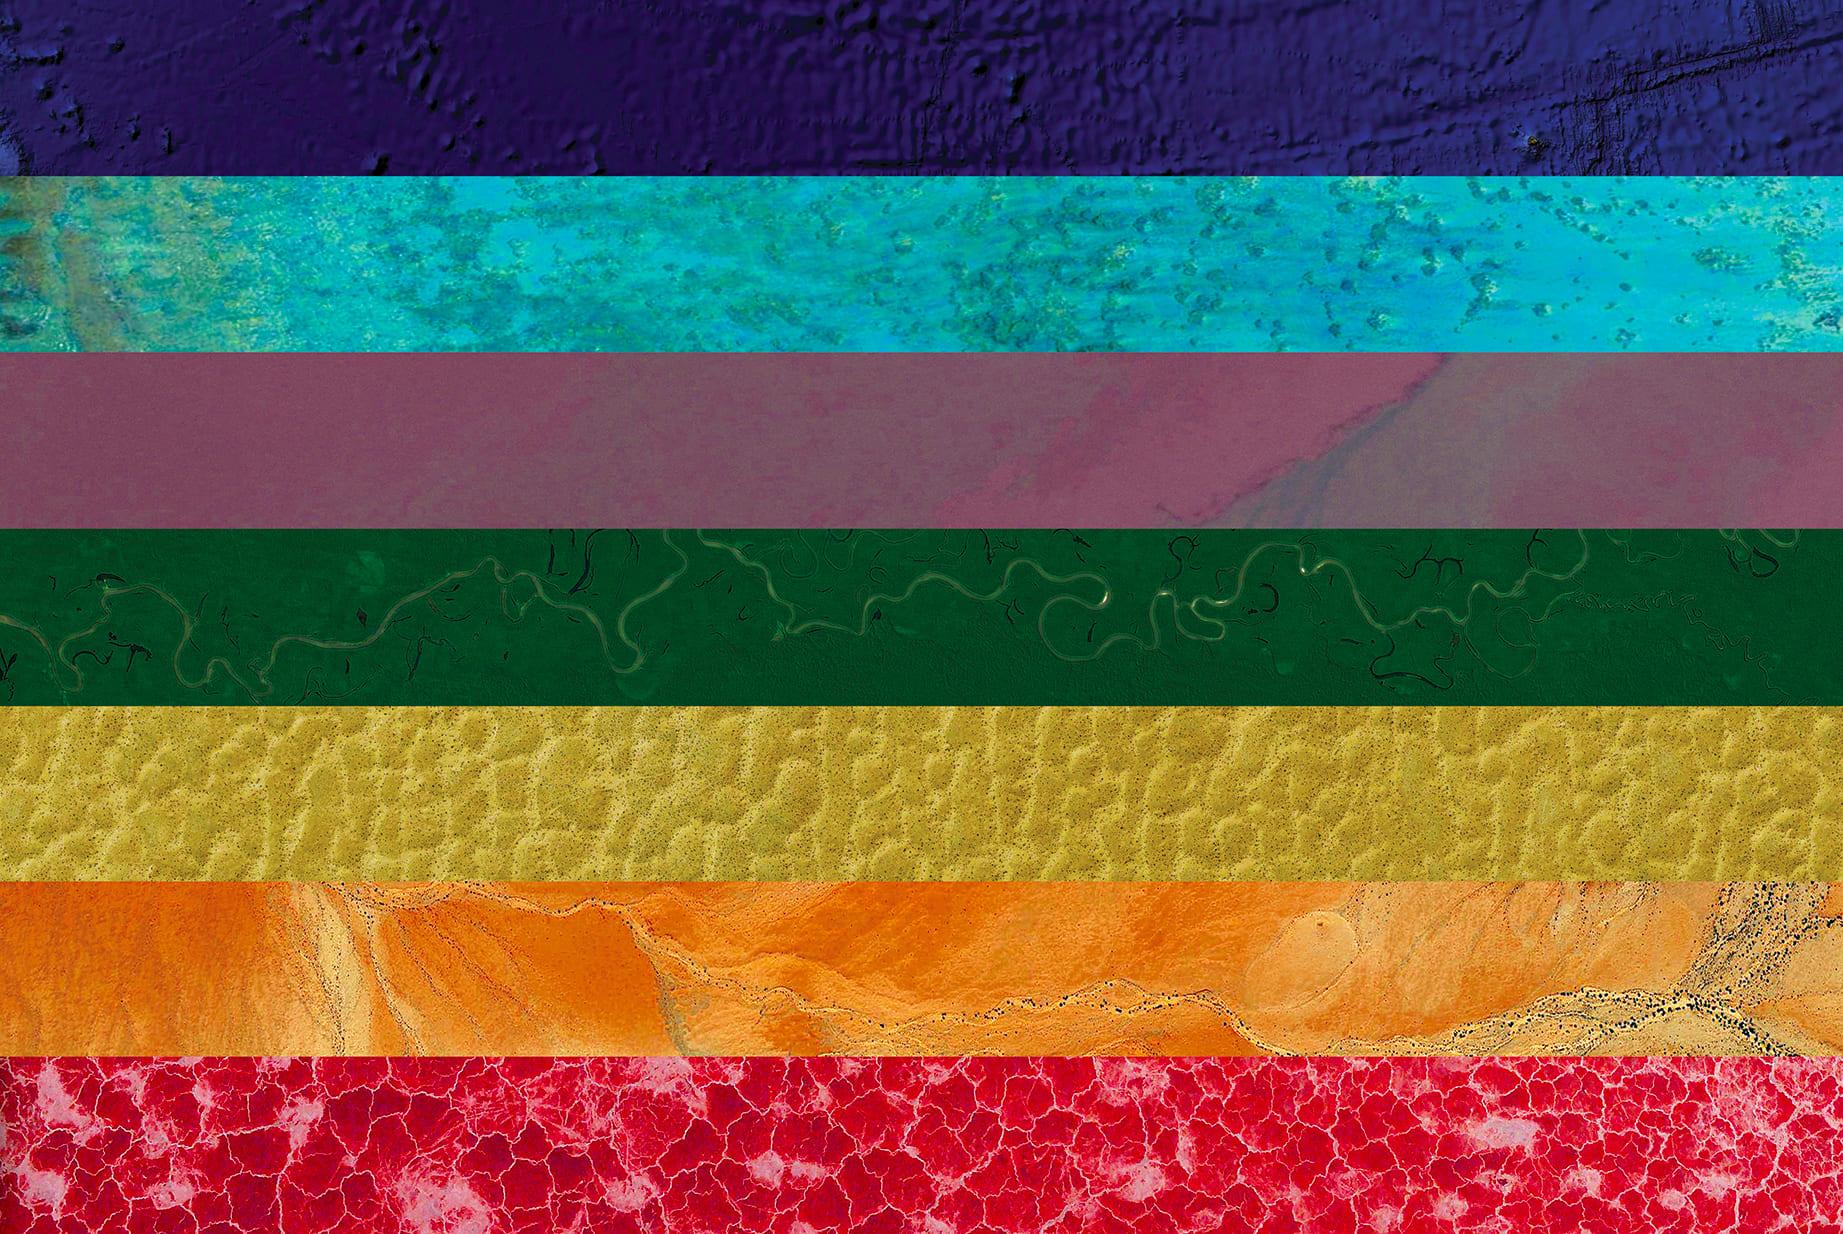 Peace Earth Flag (Atlantic Ocean, French Polynesia, Papua New Guinea, Brazil, Turkmenistan, Sudan, Tanzania), 2016, cm 67×100, 1/9